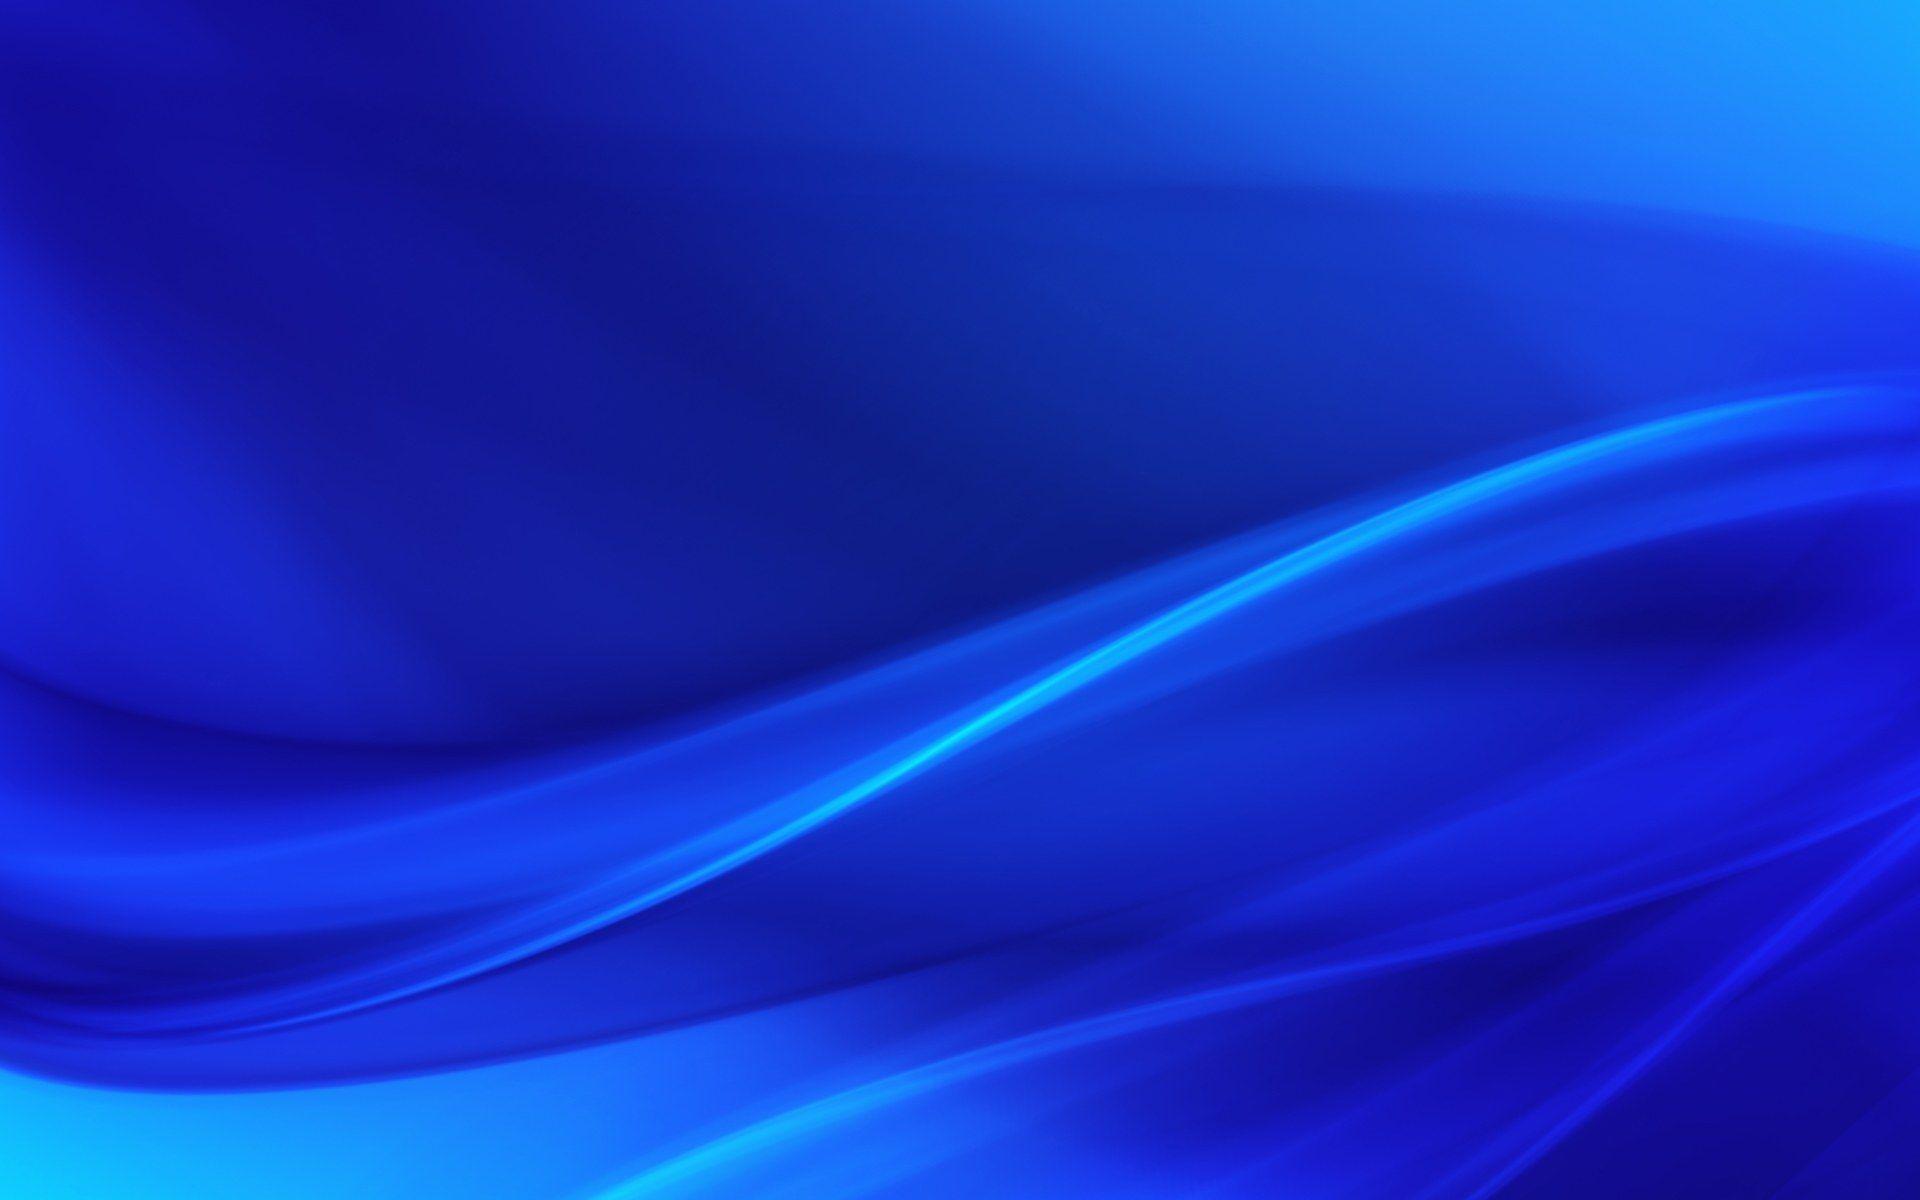 Blue Background Desktop Wallpaper Best Wallpaper Hd Blue Background Wallpapers Blue Colour Wallpaper Background Hd Wallpaper